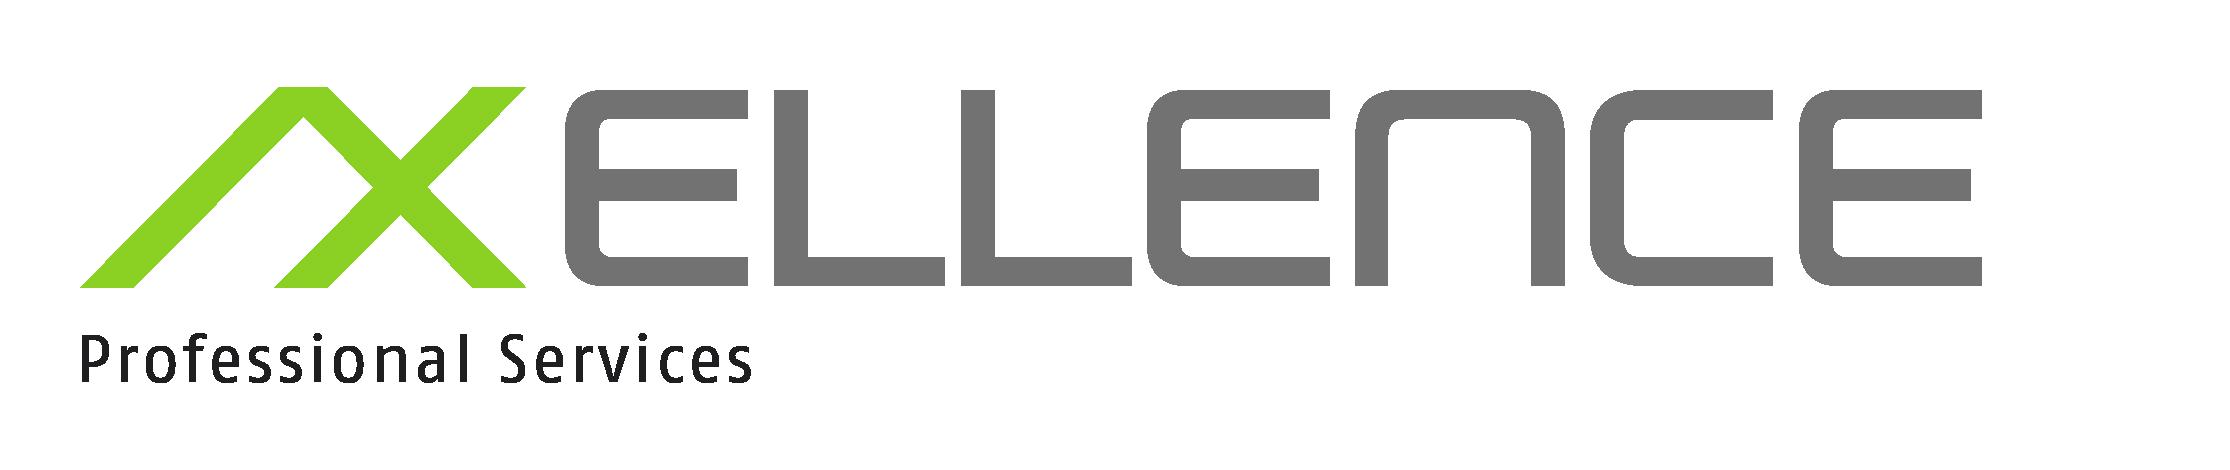 axellence_logo.png